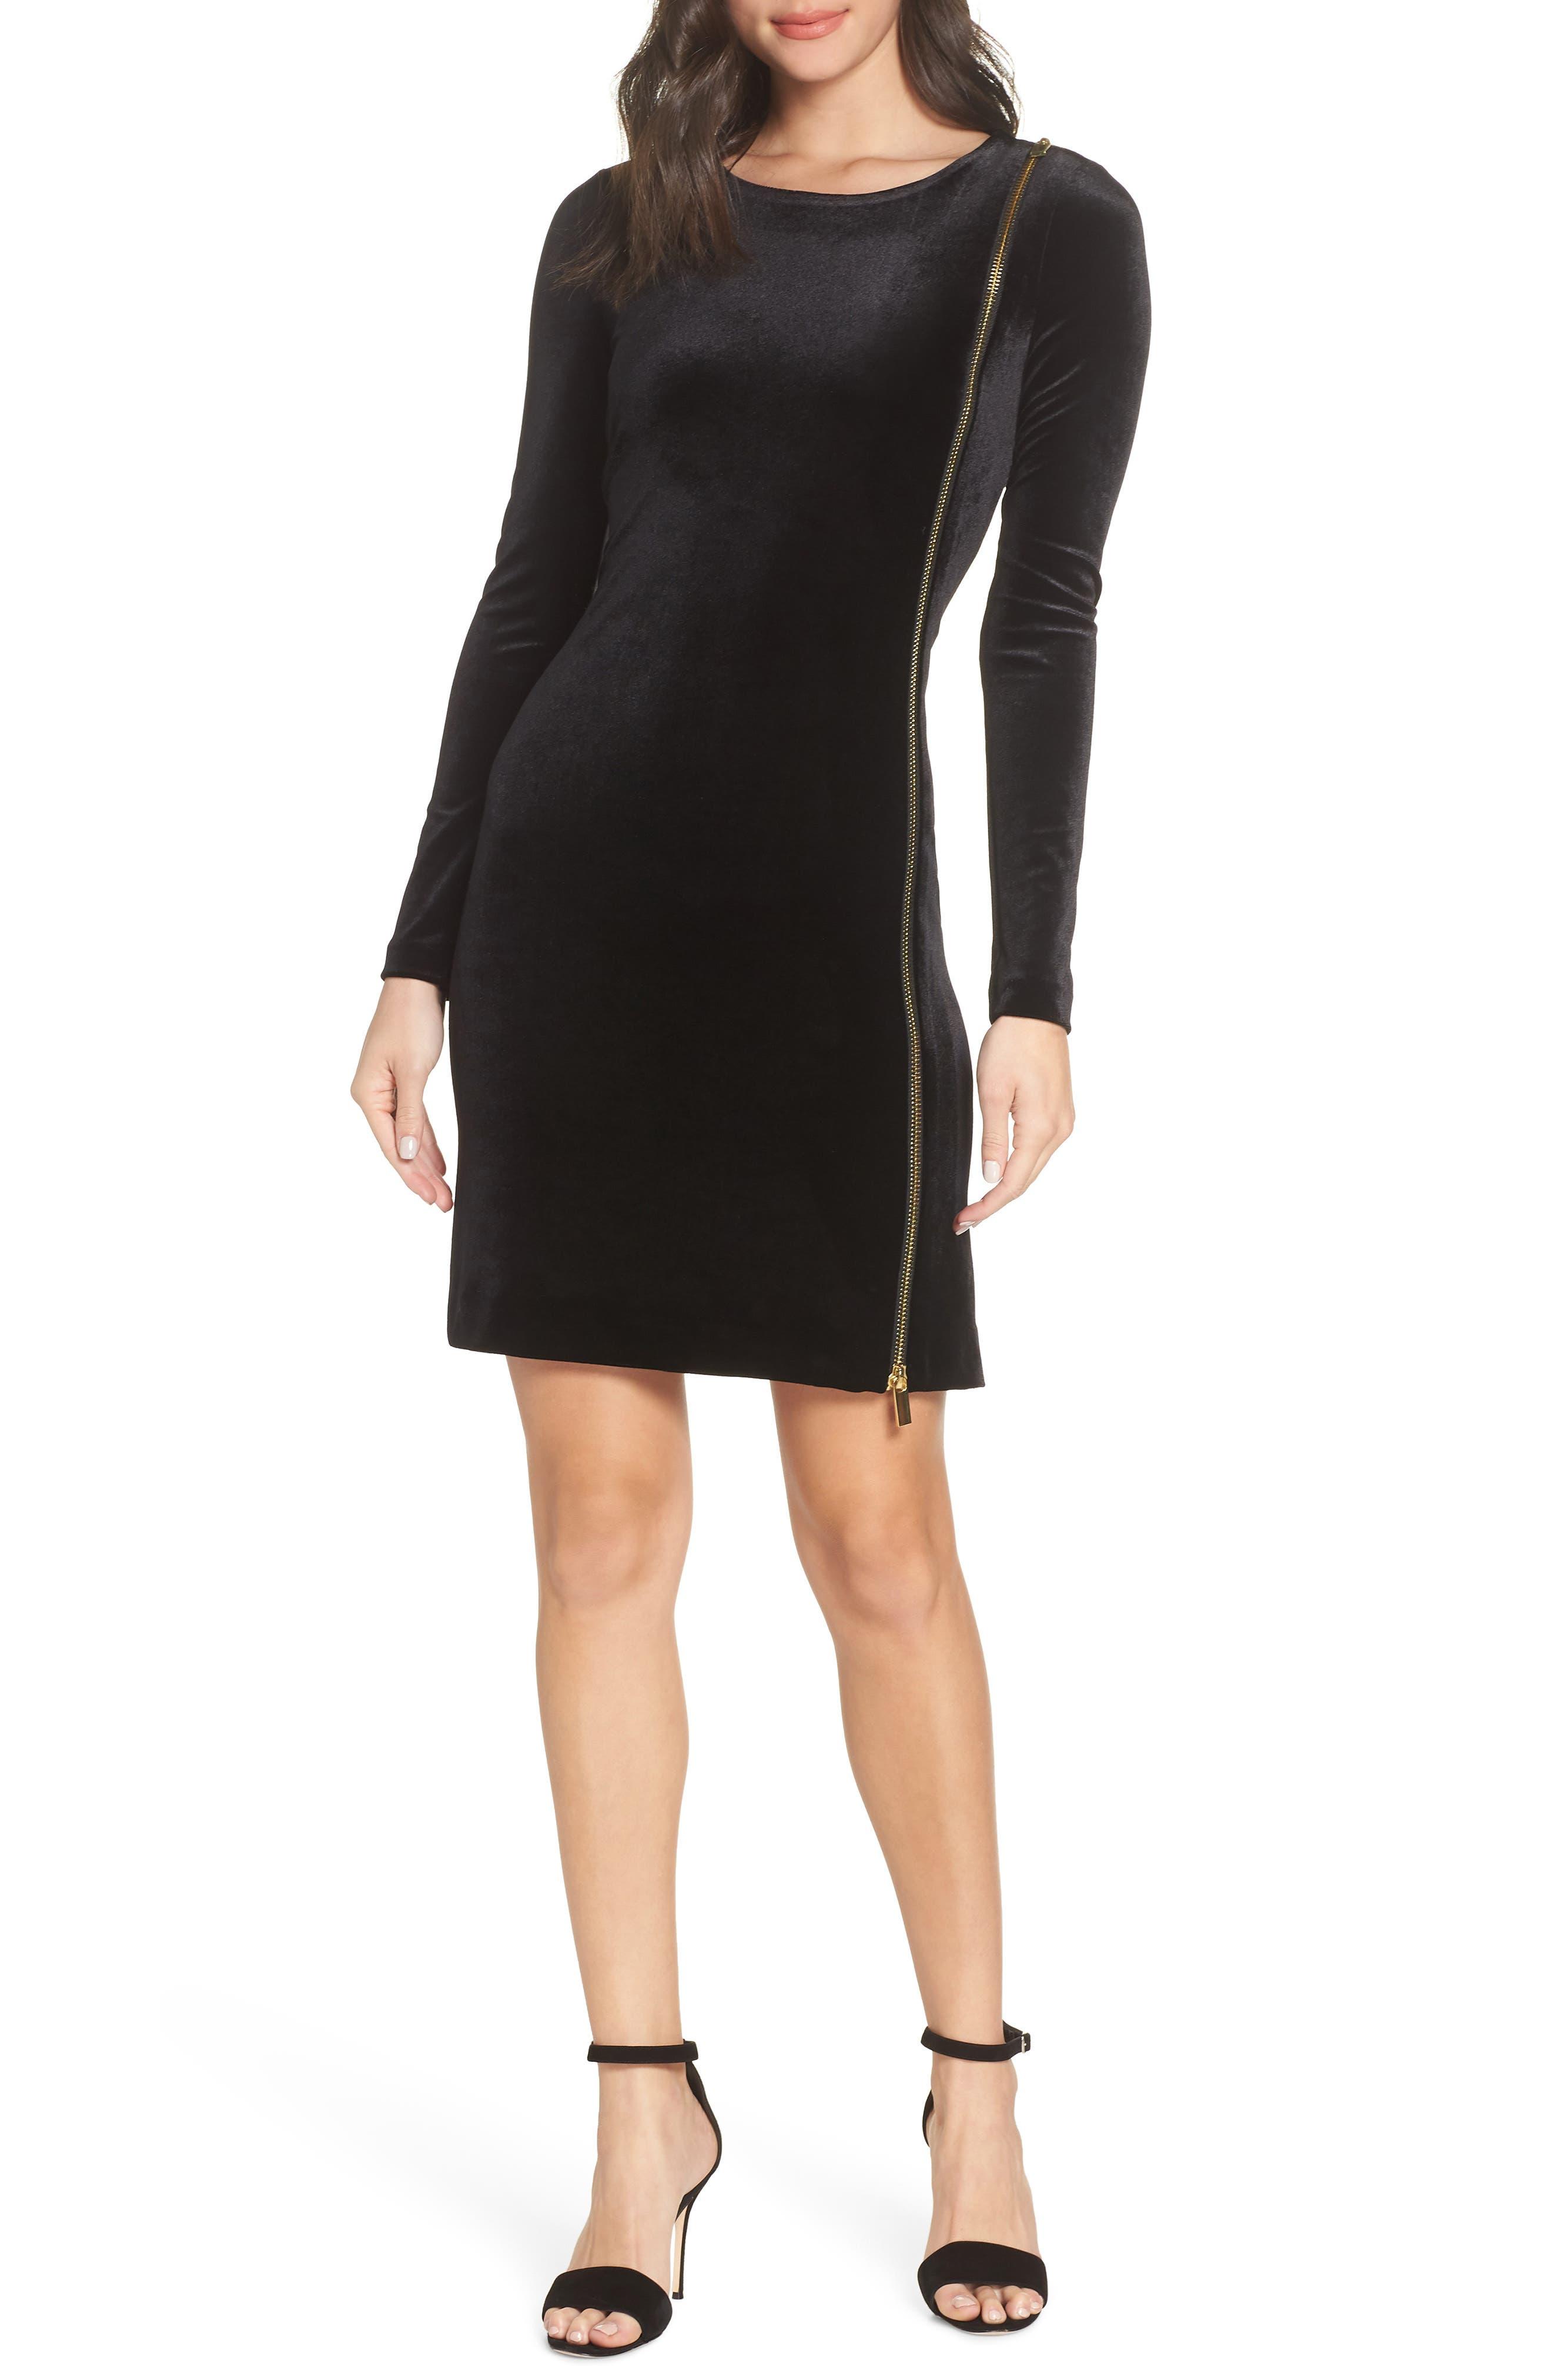 Zella Aurore Velvet Jersey Sheath Dress,                             Main thumbnail 1, color,                             BLACK GOLD